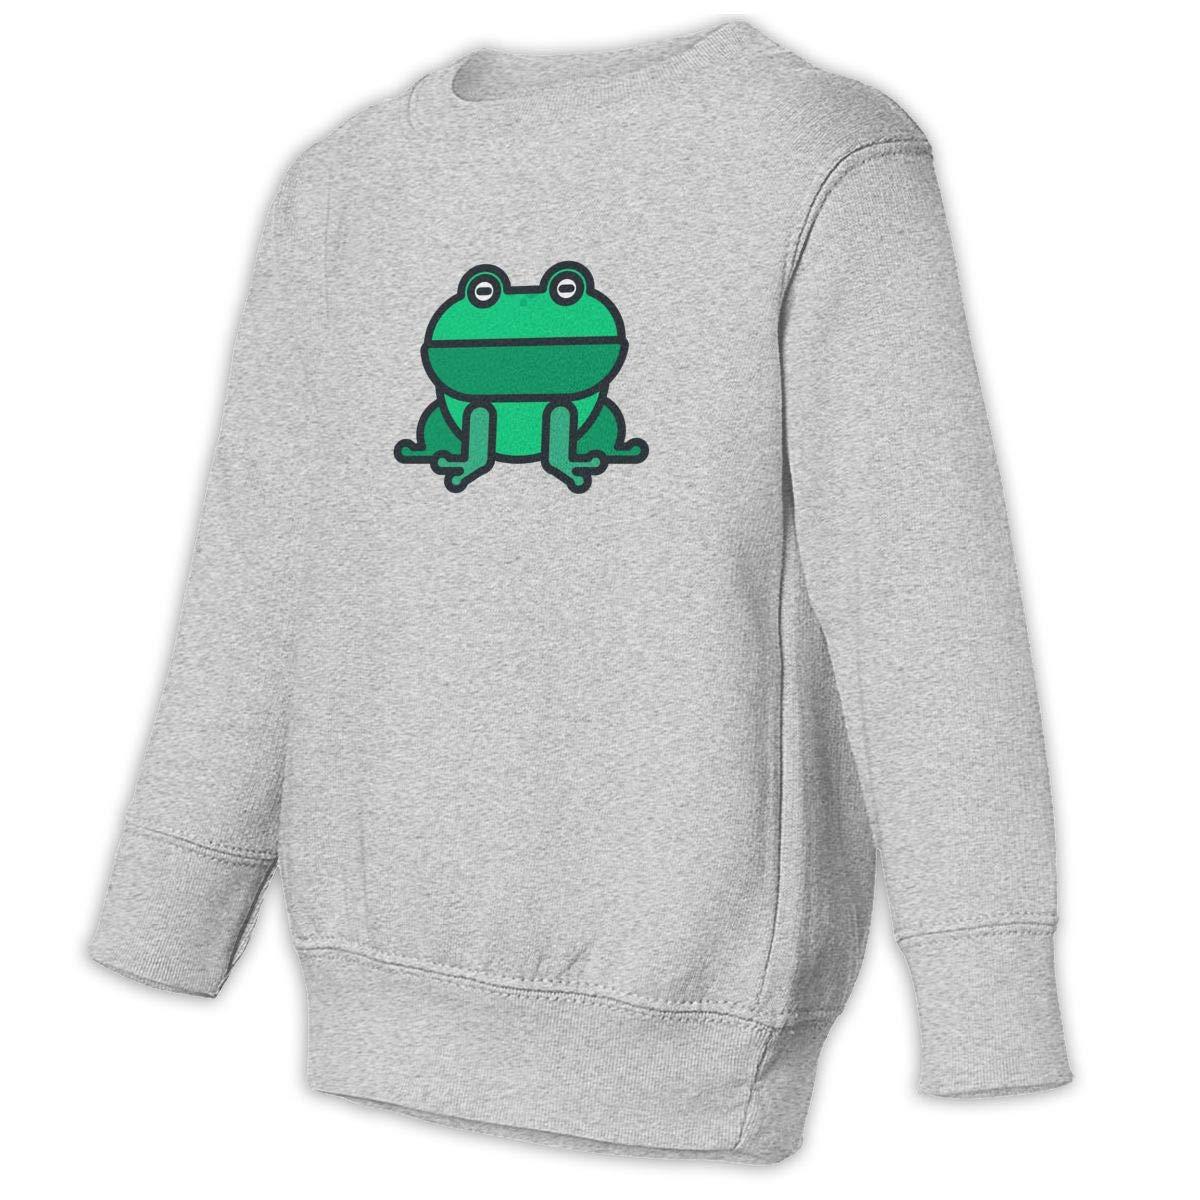 Fleece Pull Over Sweatshirt for Boys Girls Kids Youth Frog Unisex Toddler Hoodies